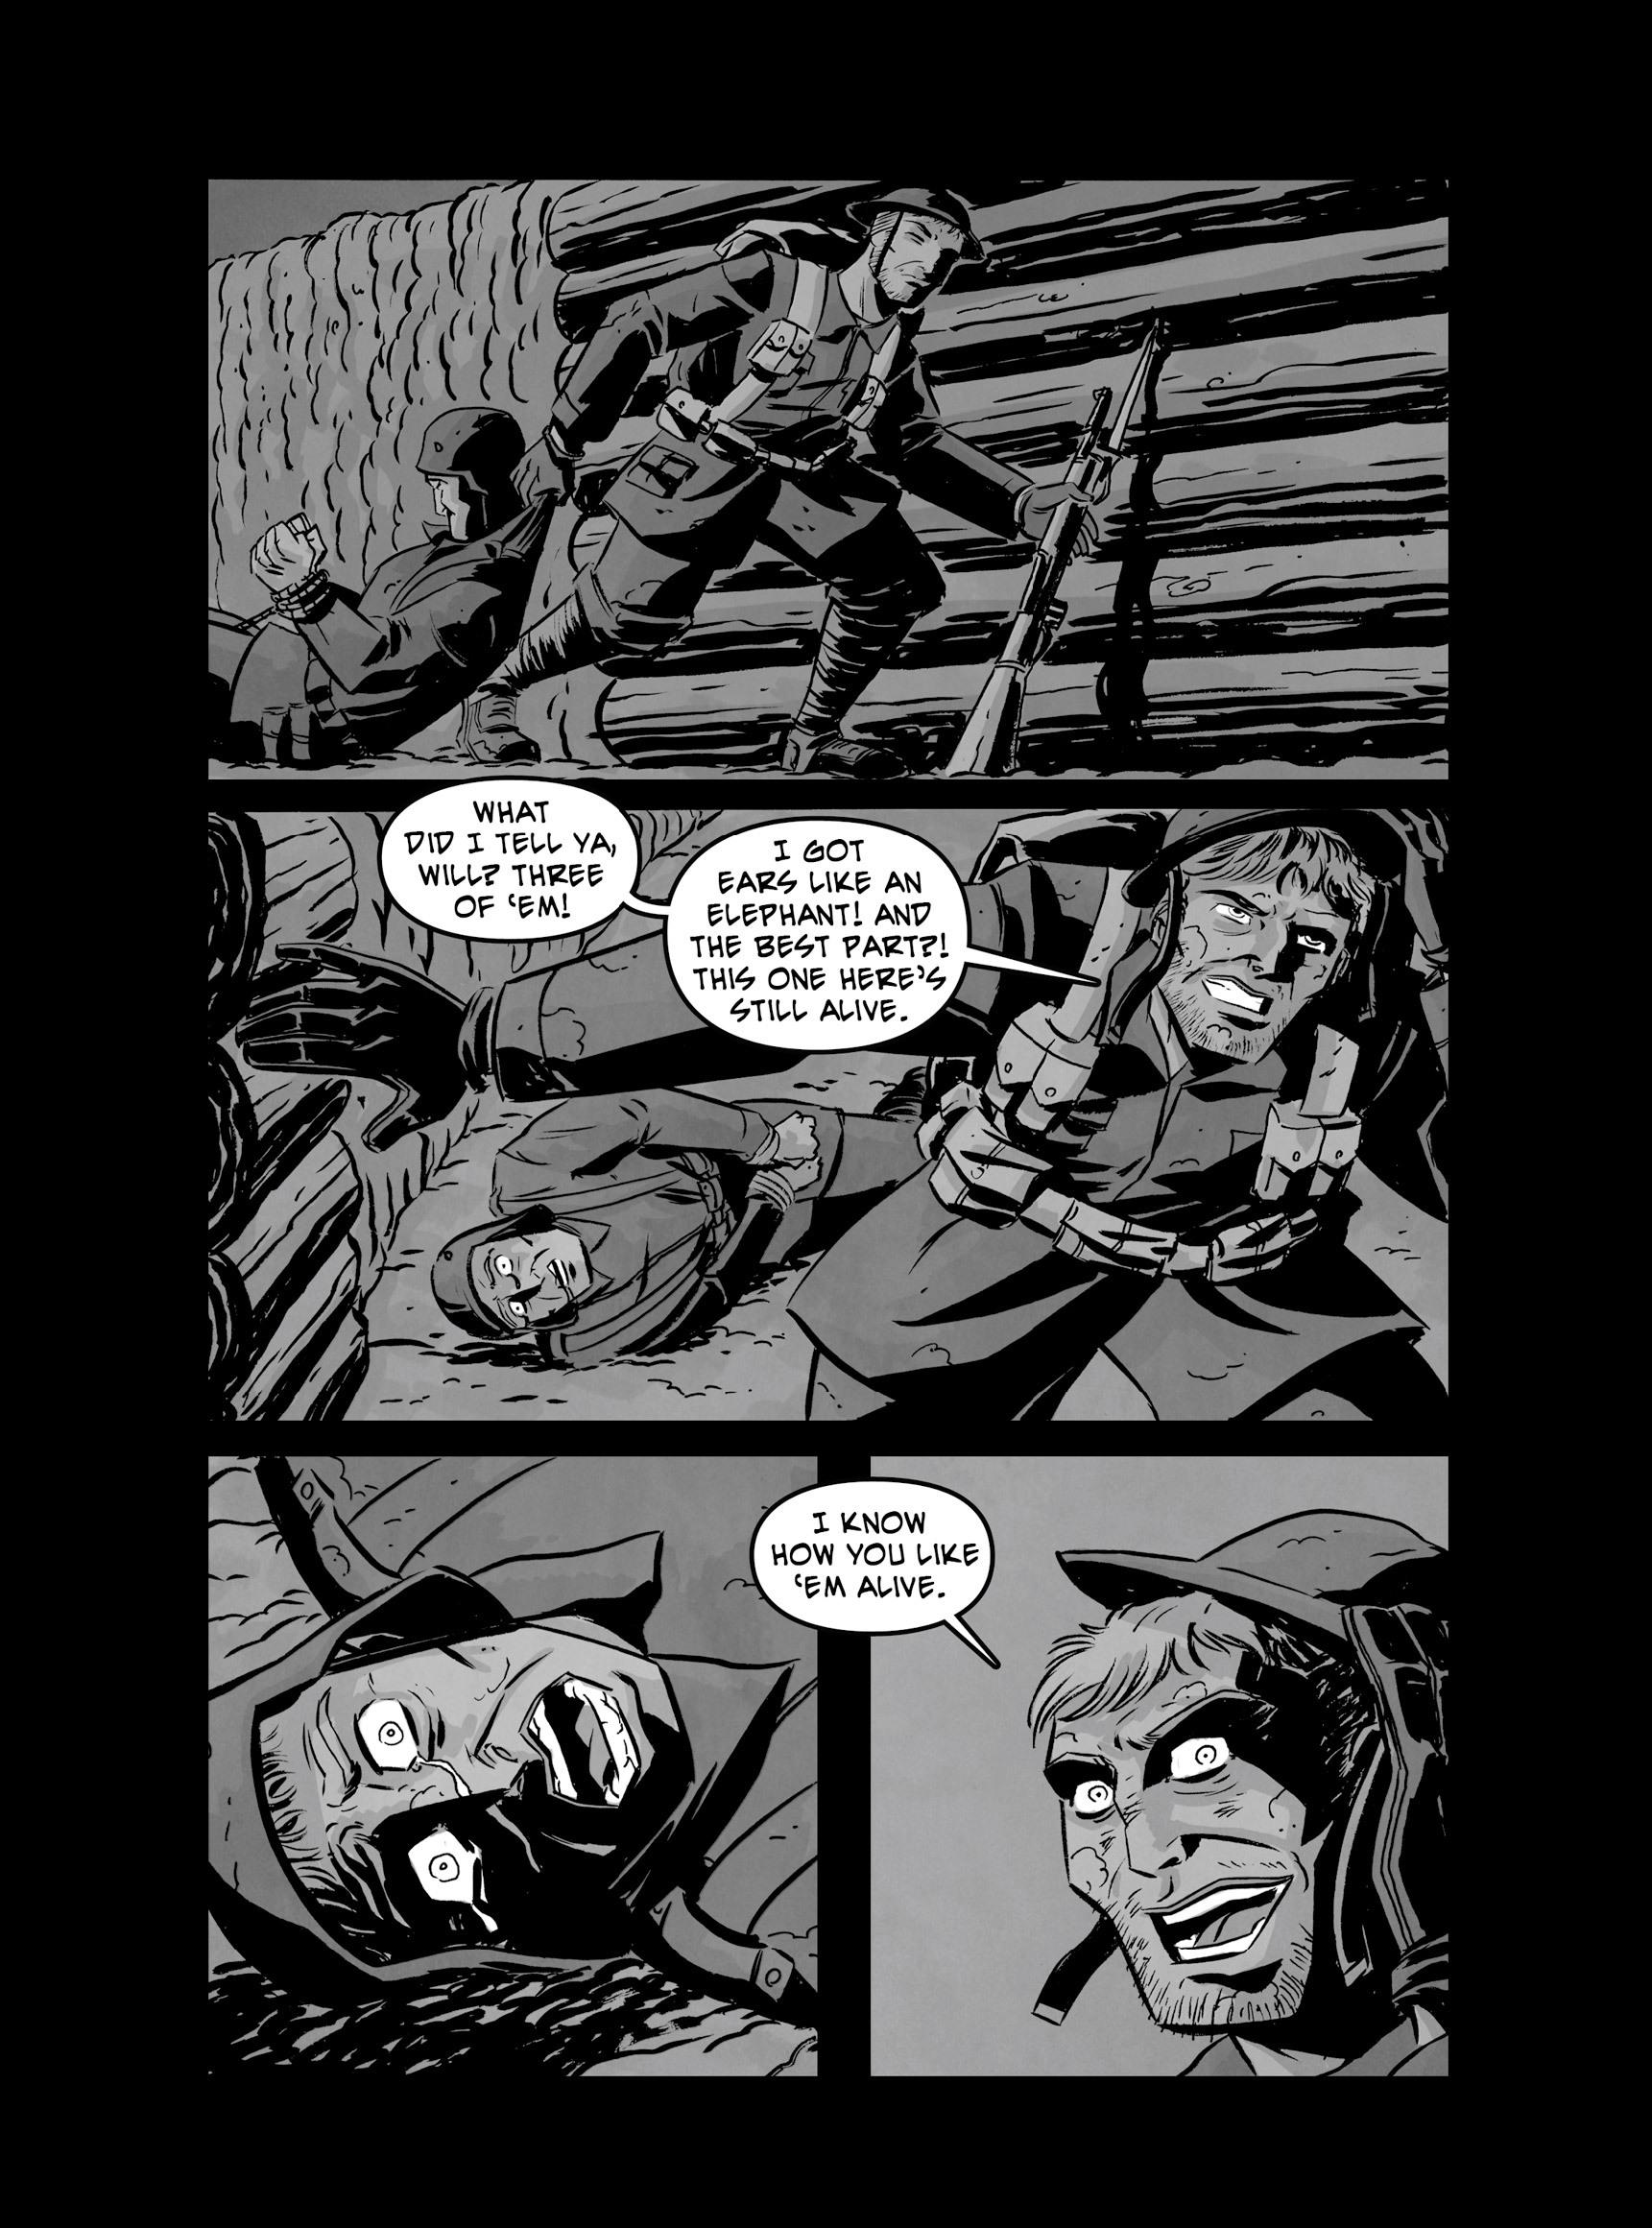 Read online FUBAR comic -  Issue #3 - 231